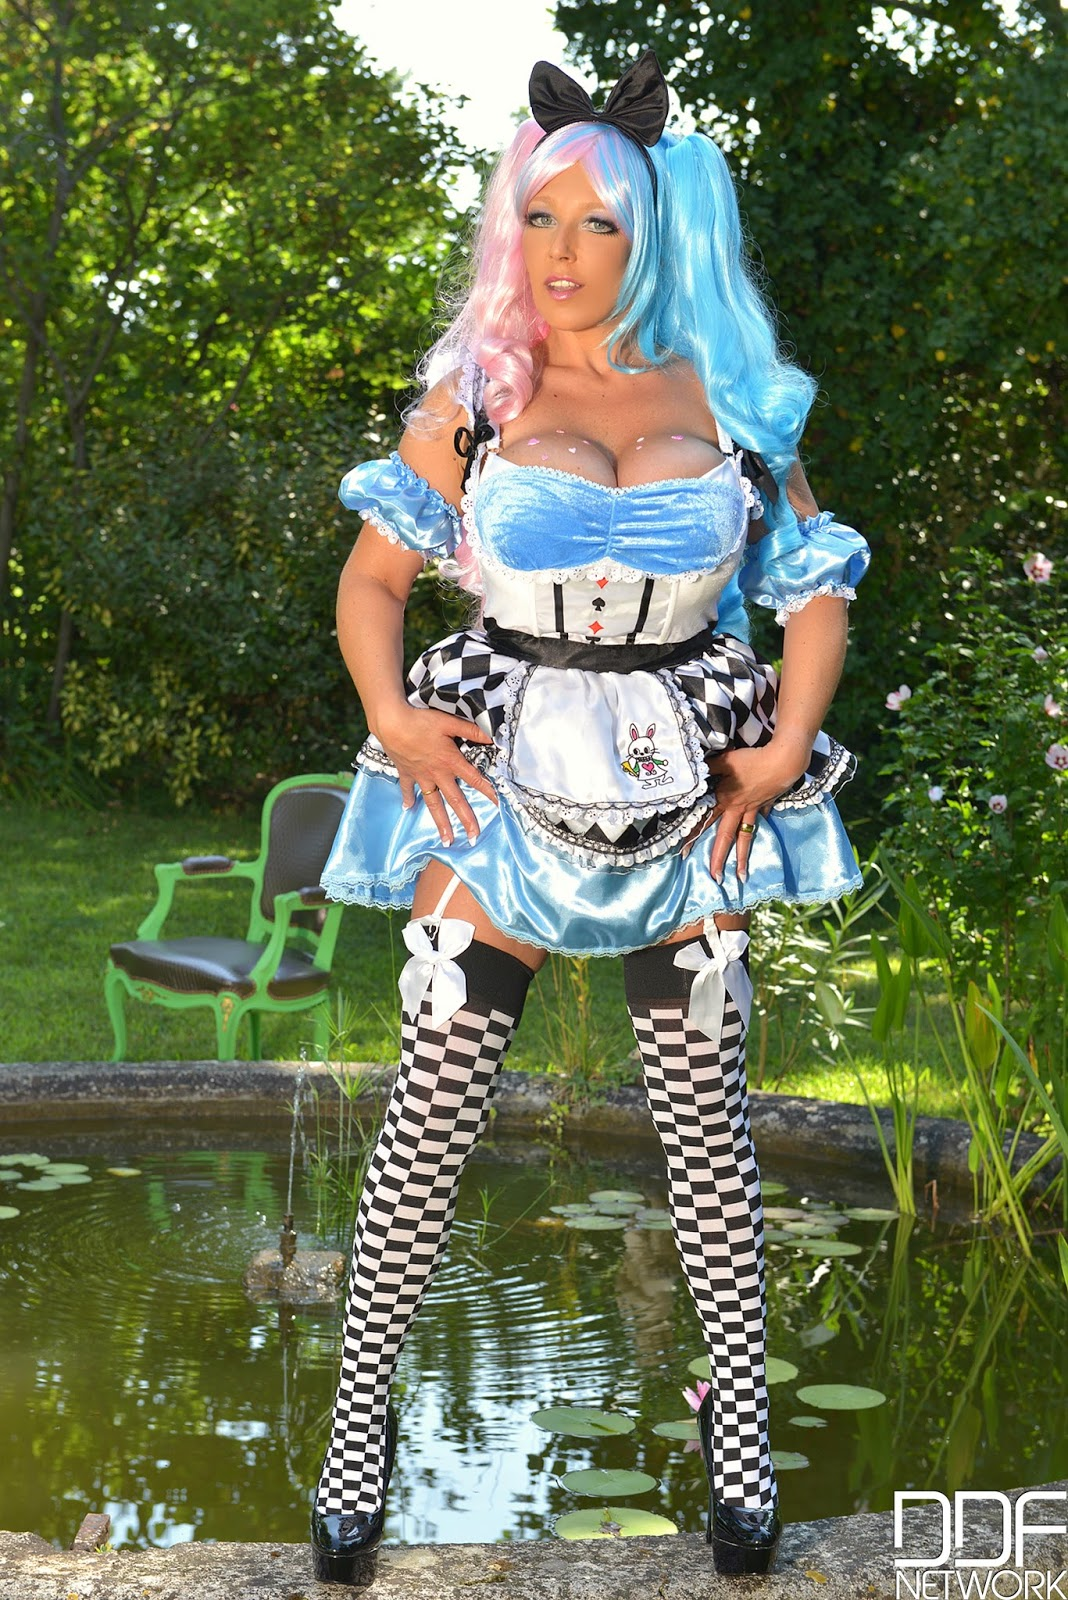 Shylea style corset porn